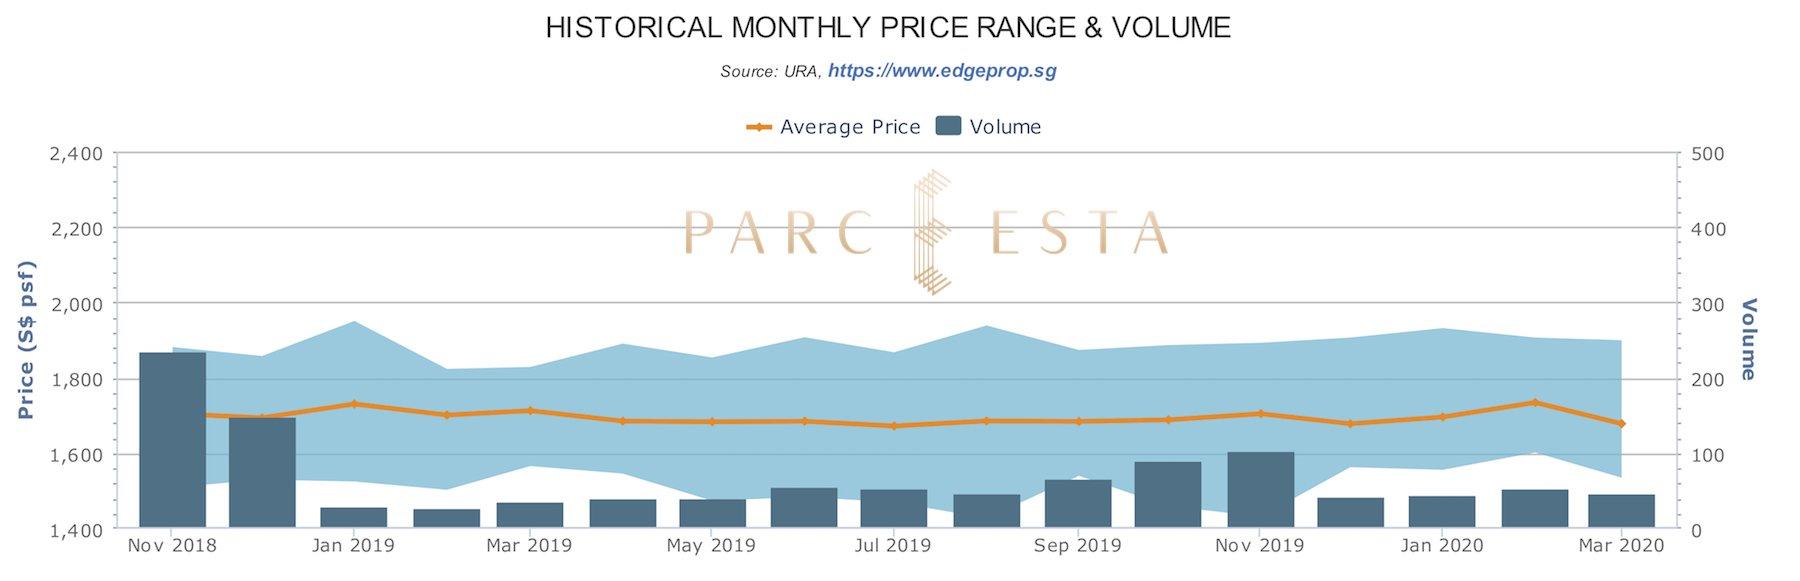 Parc Esta 东景苑 recent sales trend price and volume